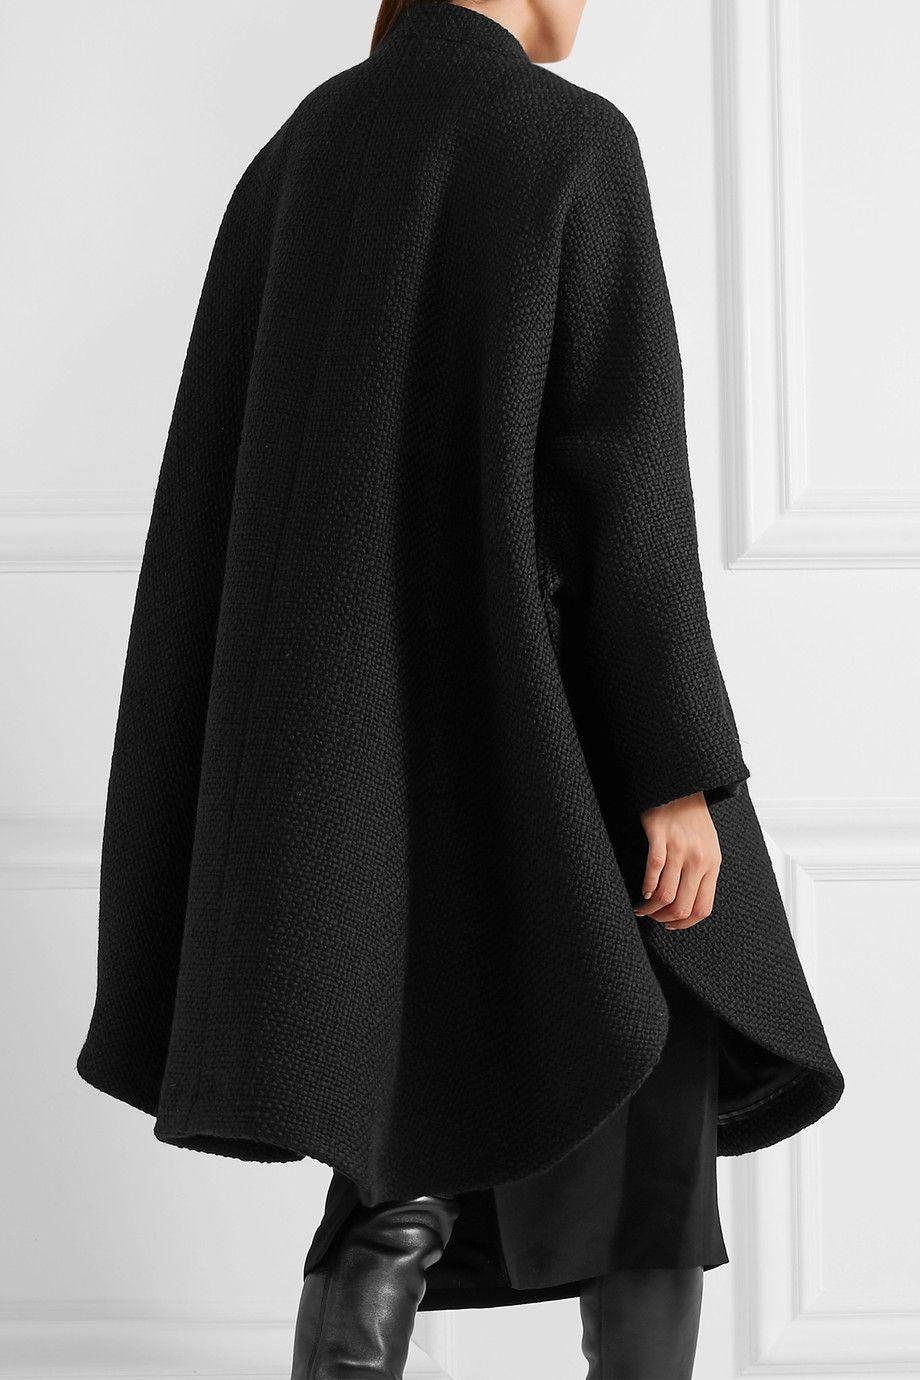 TOM FORD | Wool-blend tweed cape | NET-A-PORTER.COM